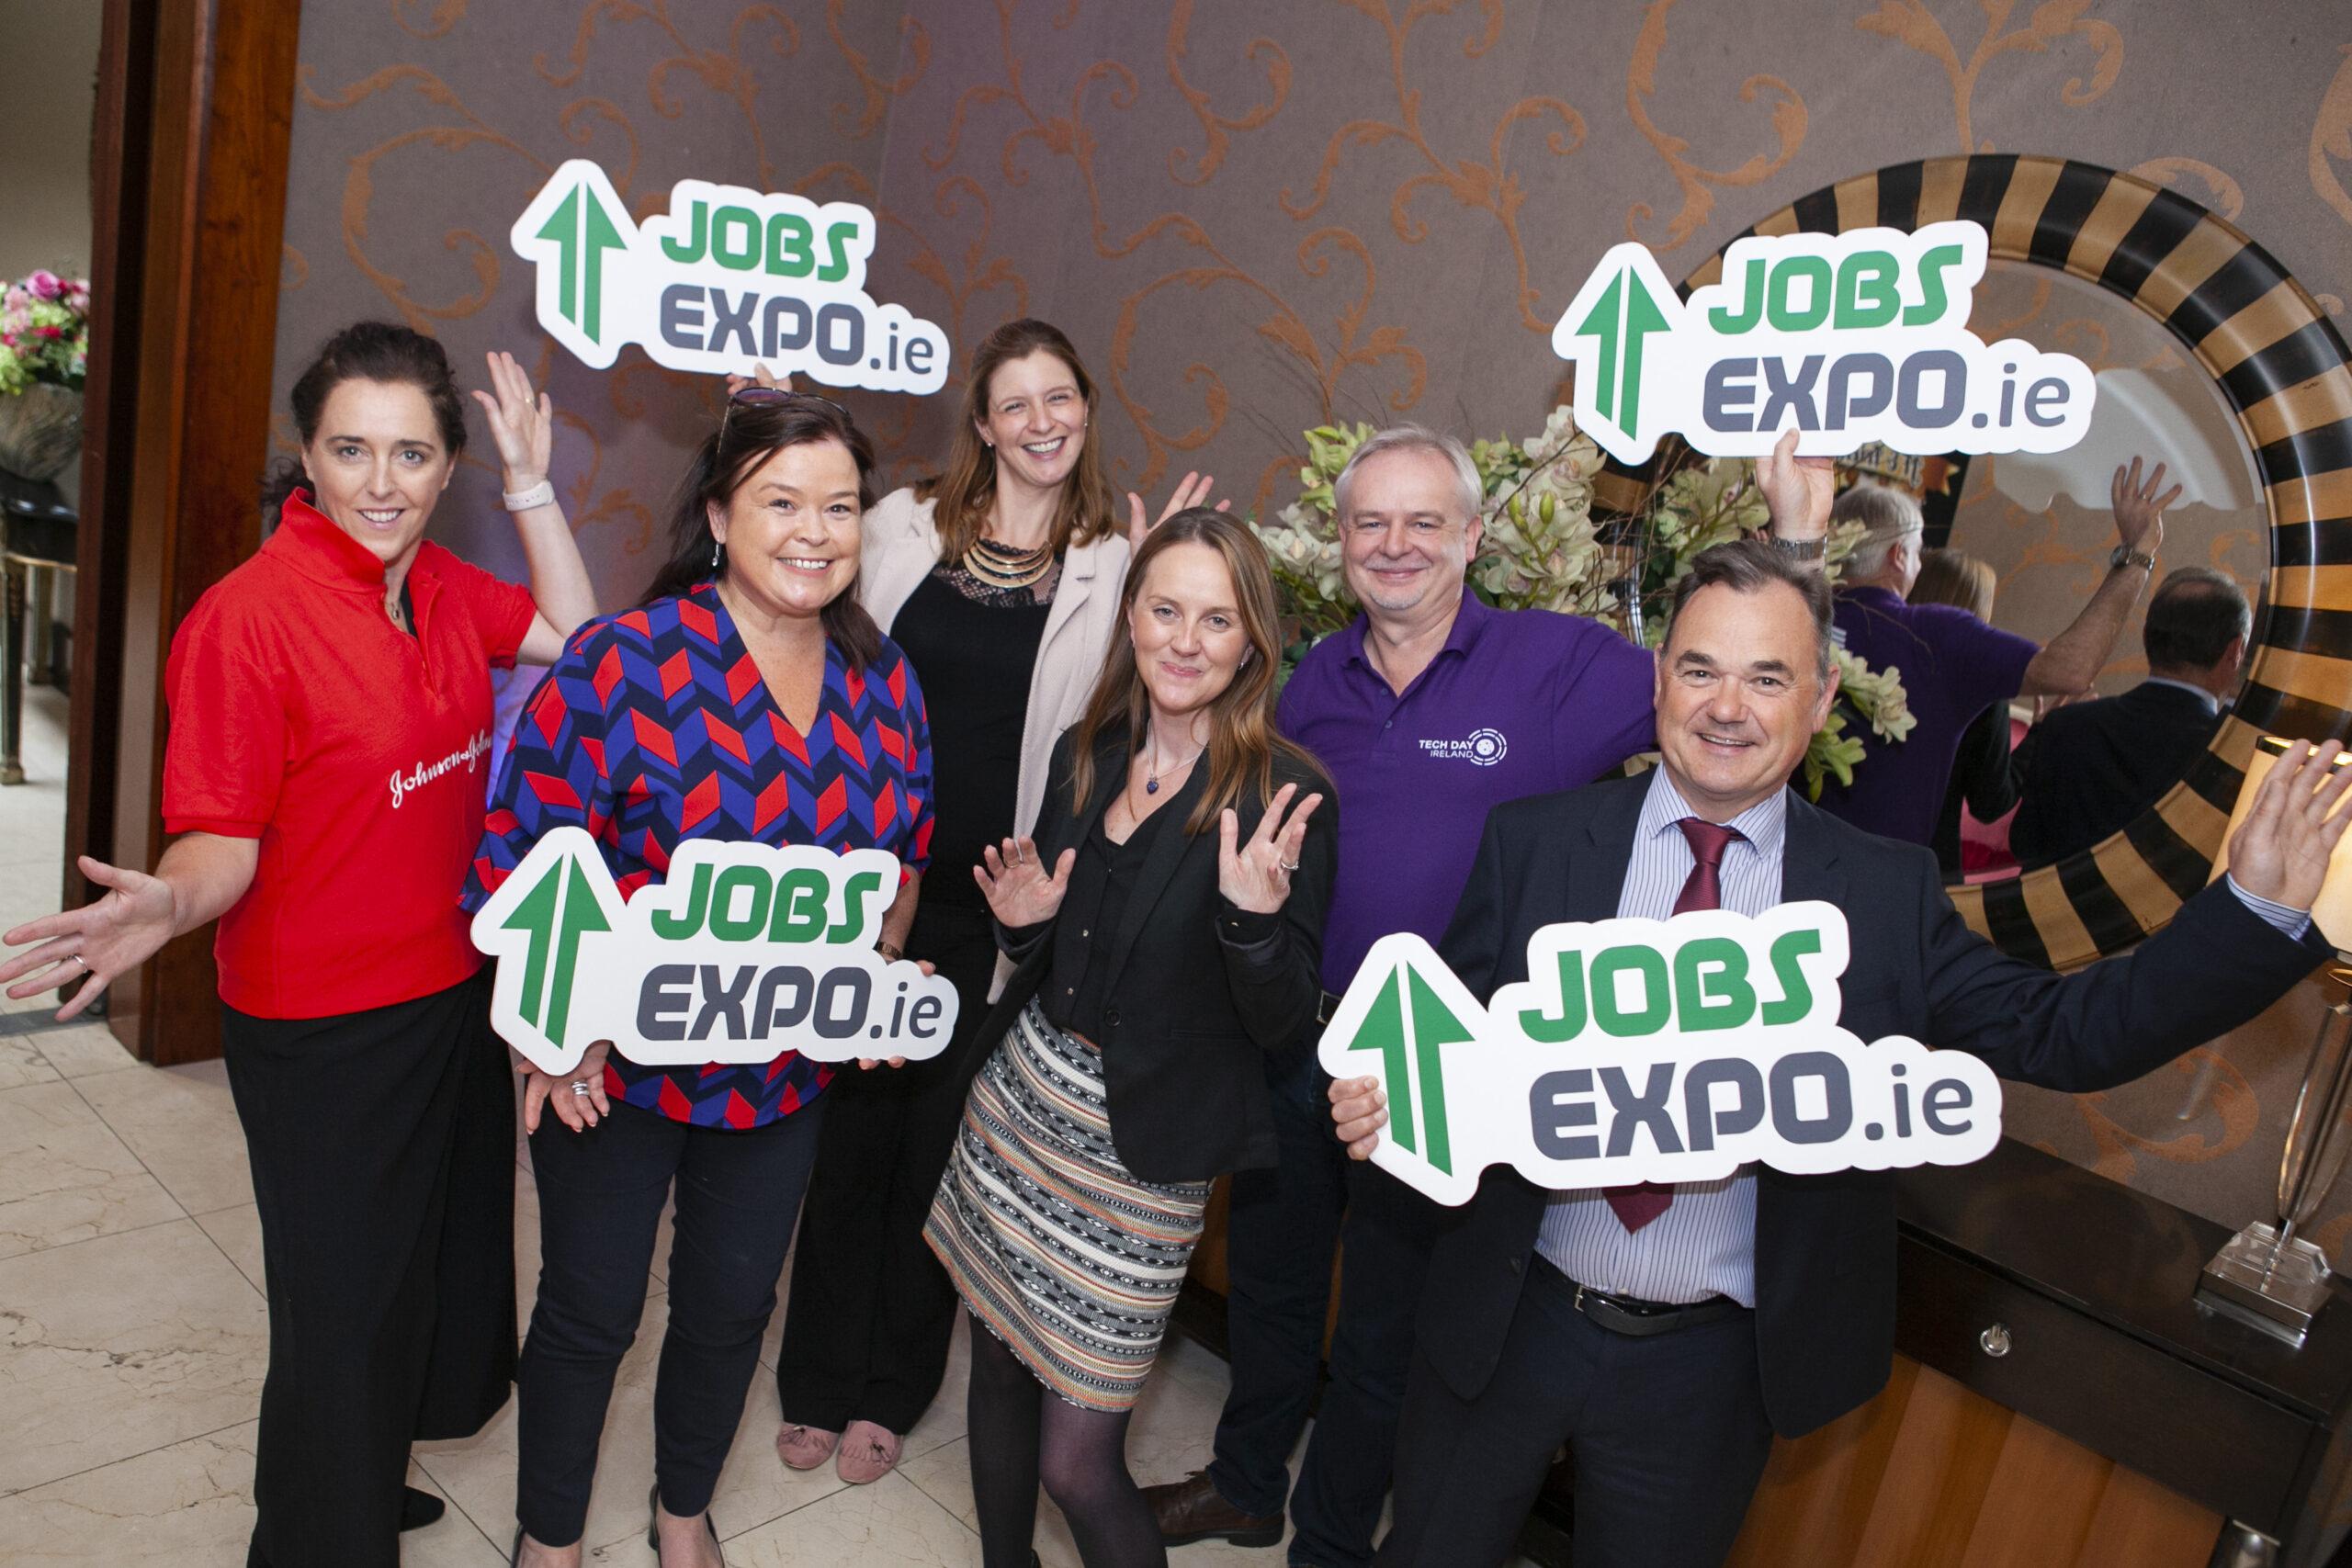 Jobs Expo Wins Best Irish Jobs & Recruitment Fair 2019